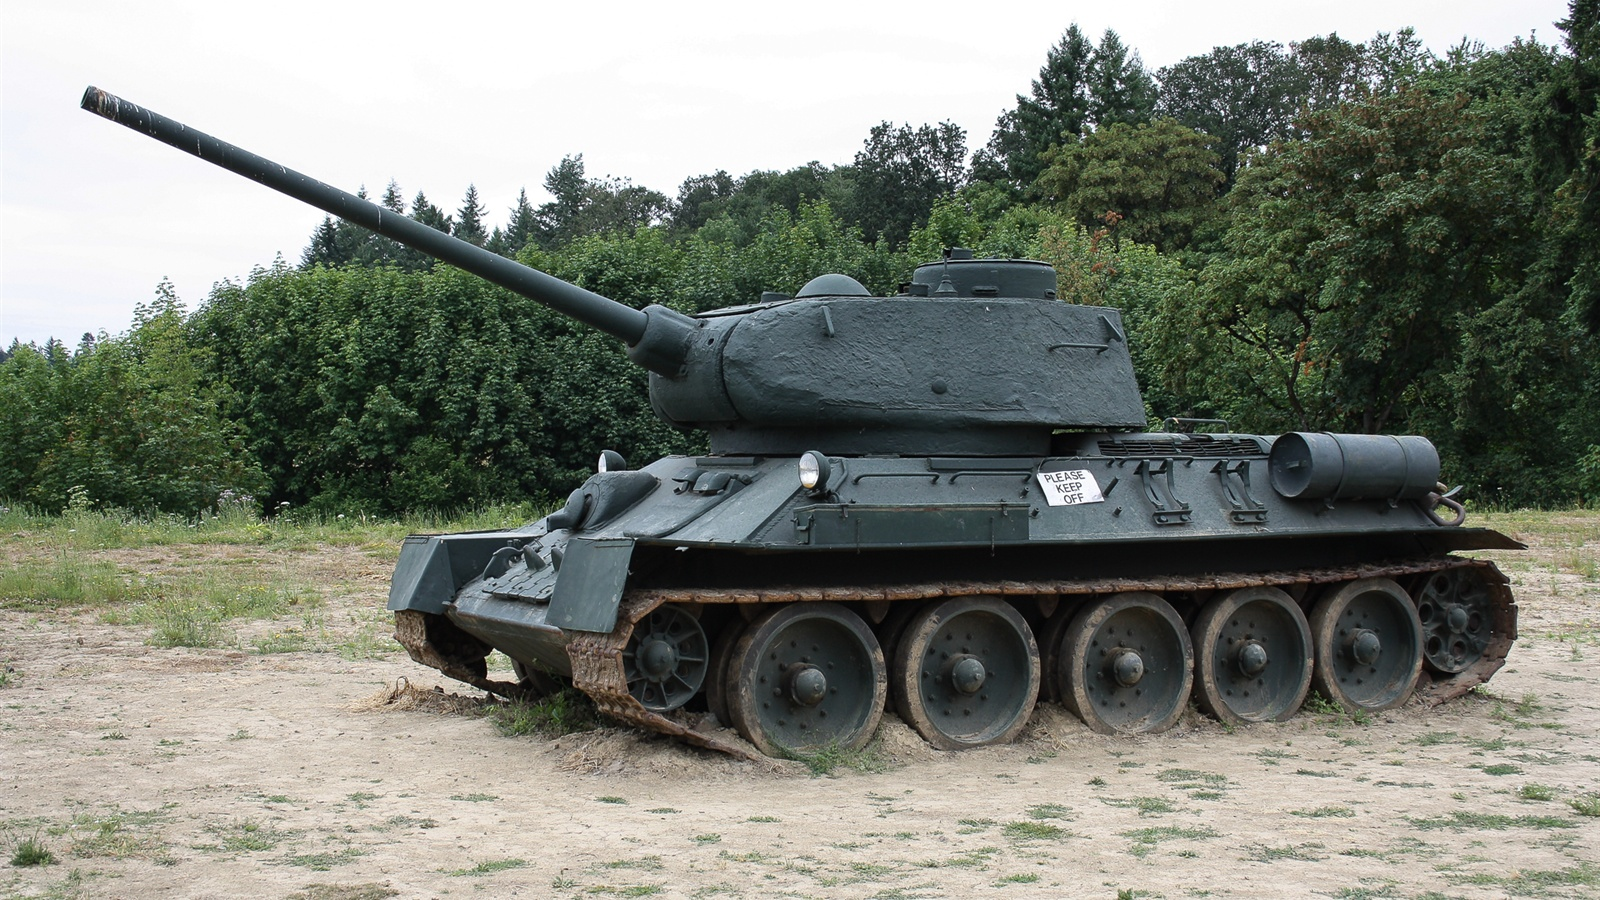 Wallpaper Soviet T 34 85 Tank 1920x1200 Hd Picture Image